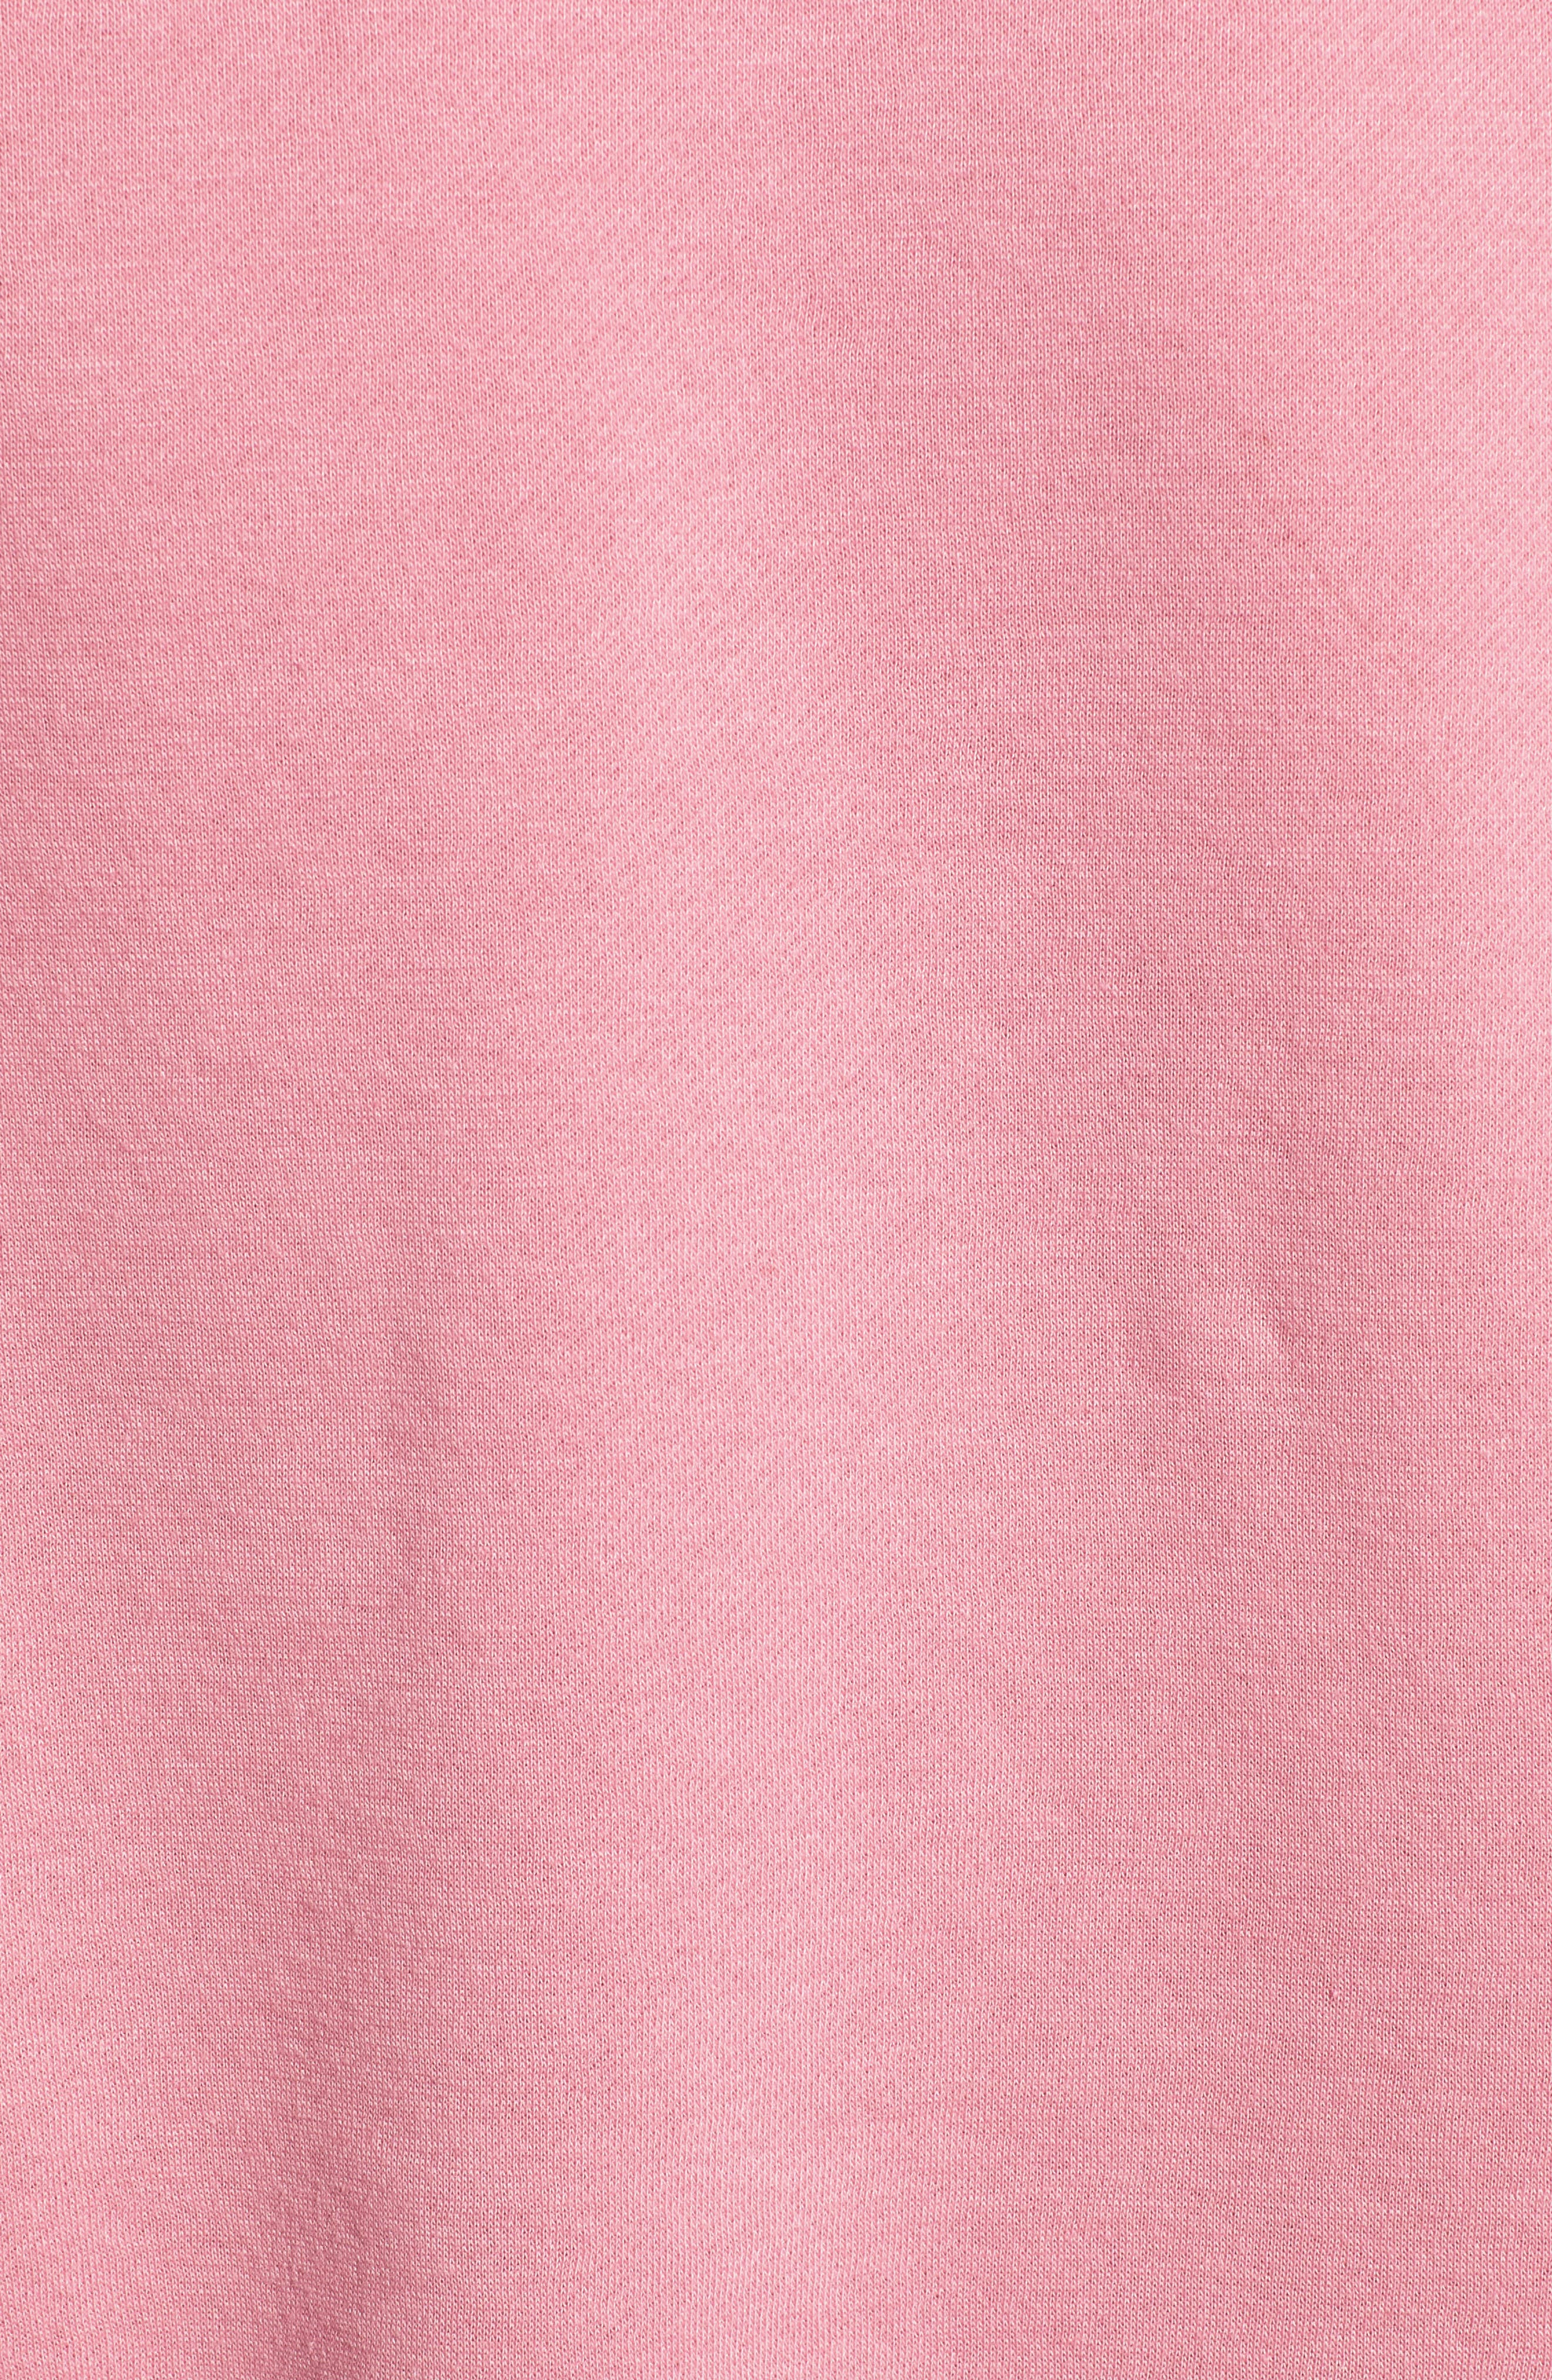 No Regrets Sweatshirt,                             Alternate thumbnail 5, color,                             CLAY ROSE/ WHITE